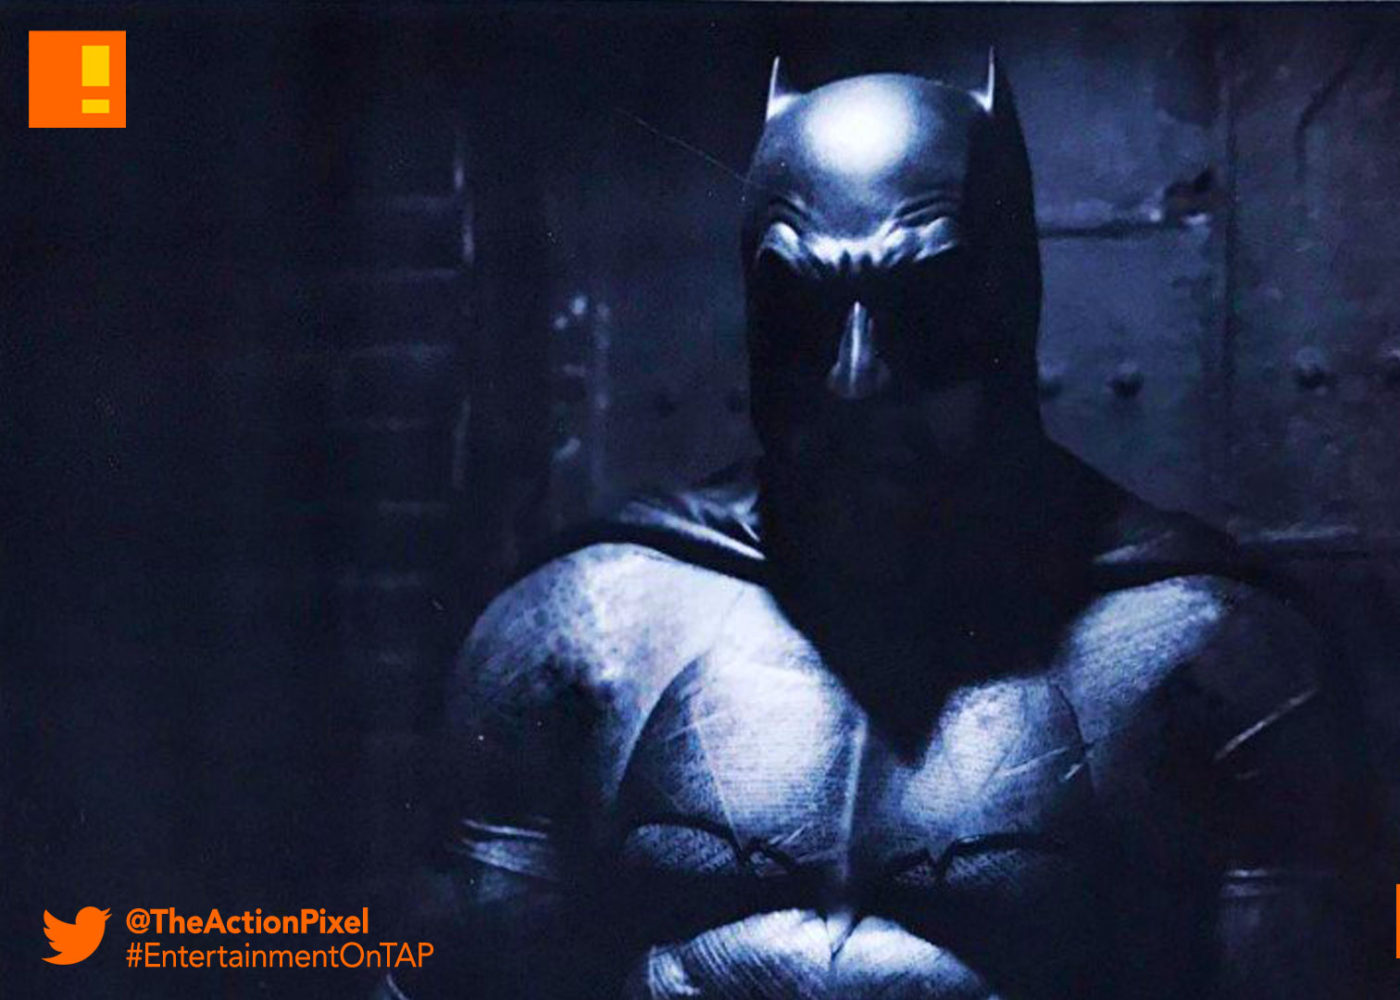 batman, ben affleck, the action pixel, entertainment on tap,zack snyder